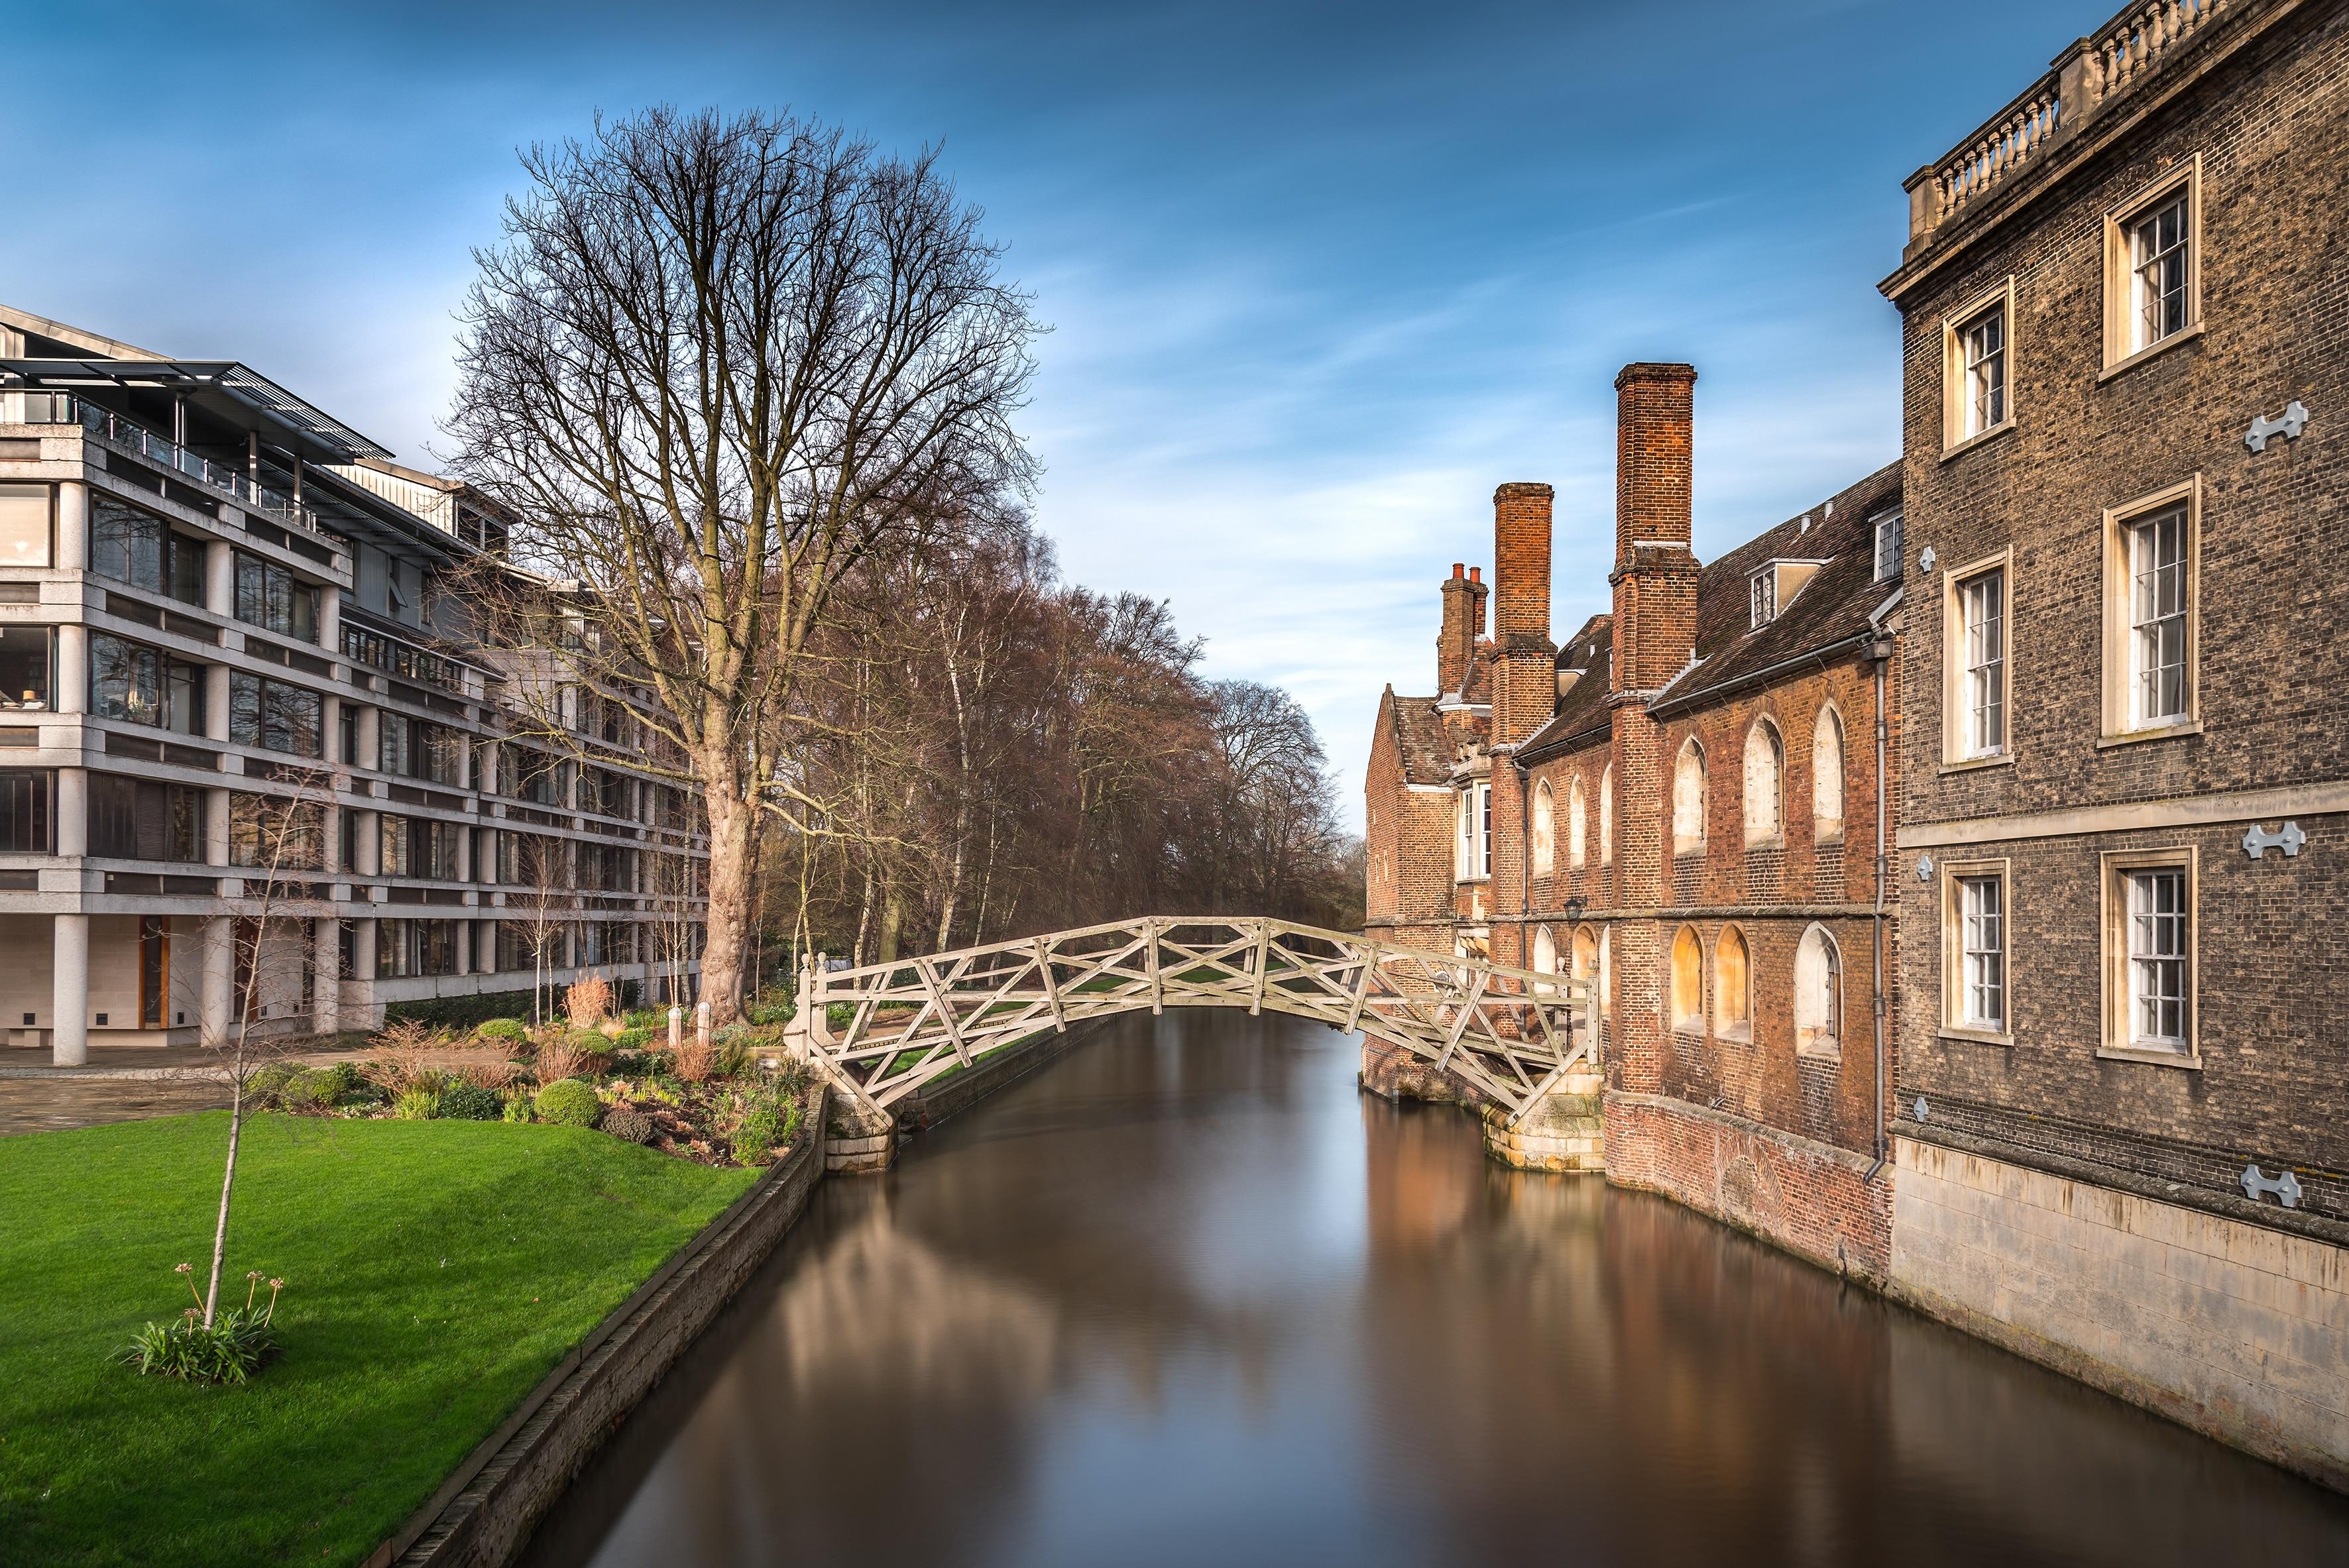 Université de Cambridge, Cambridge, Angleterre, Royaume-Uni